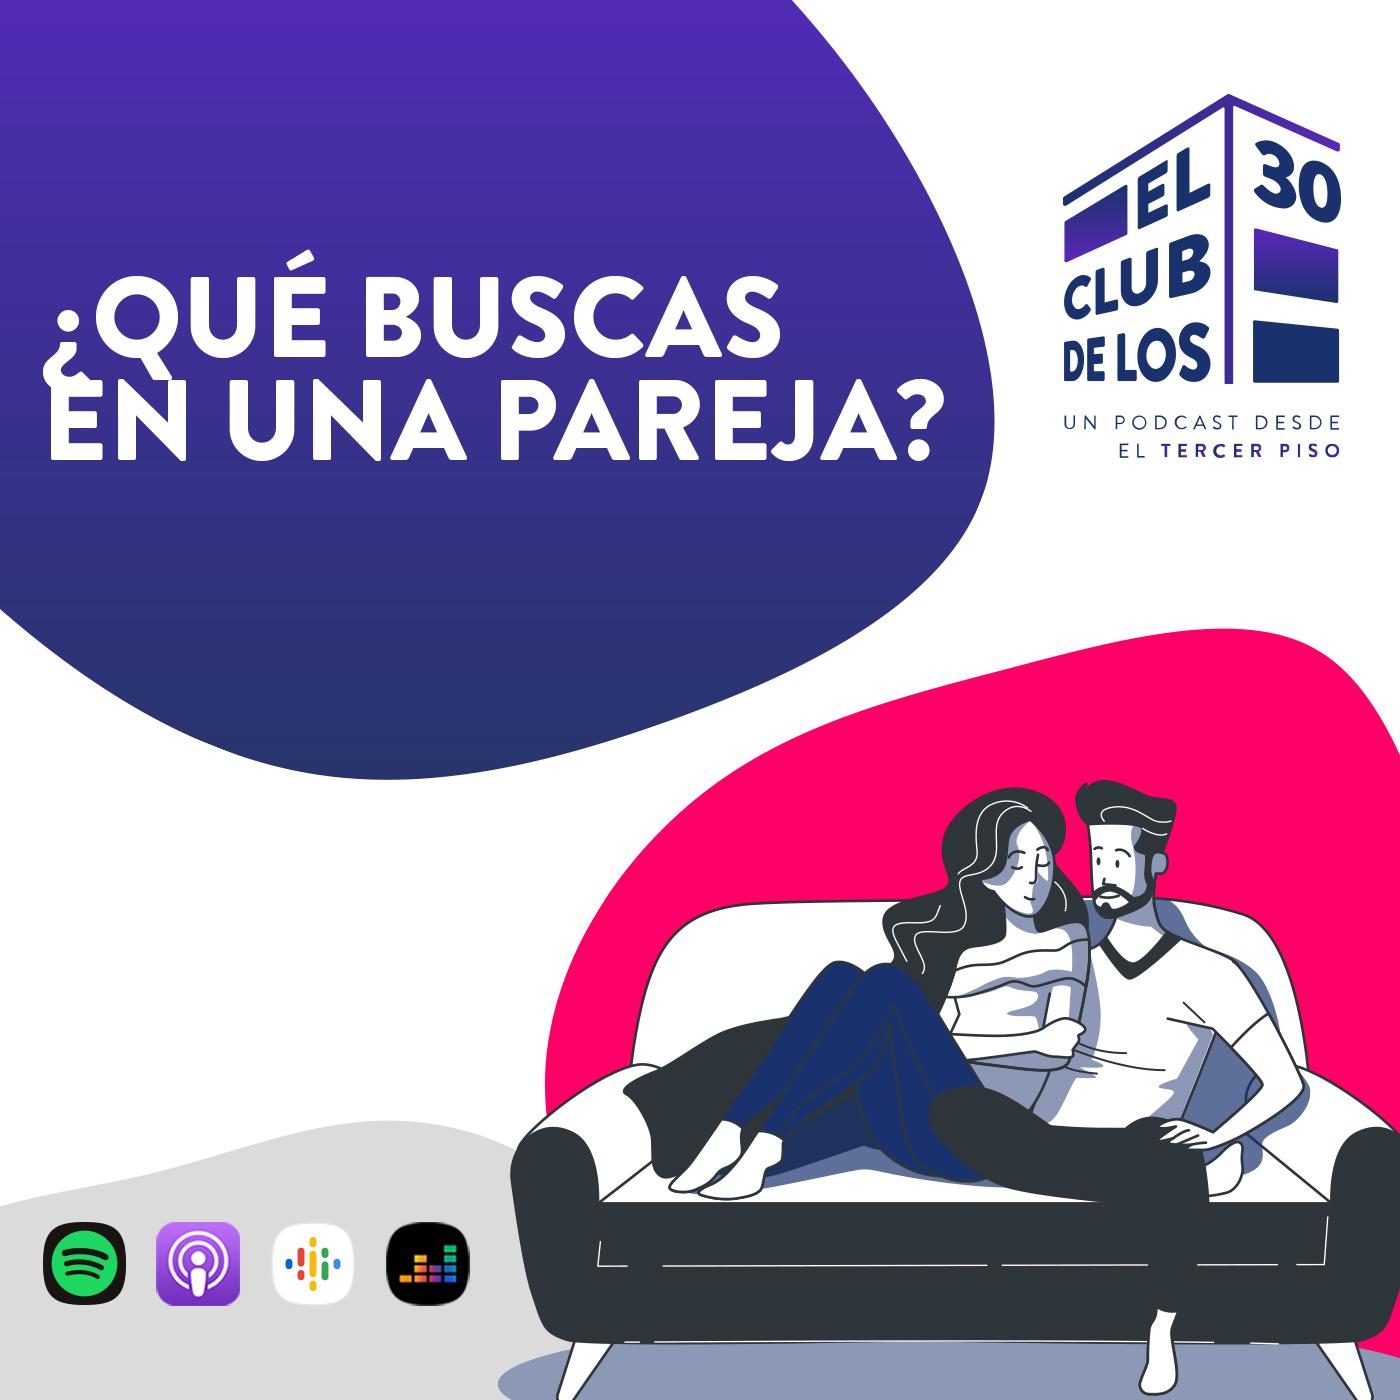 Artwork for podcast El club de los 30